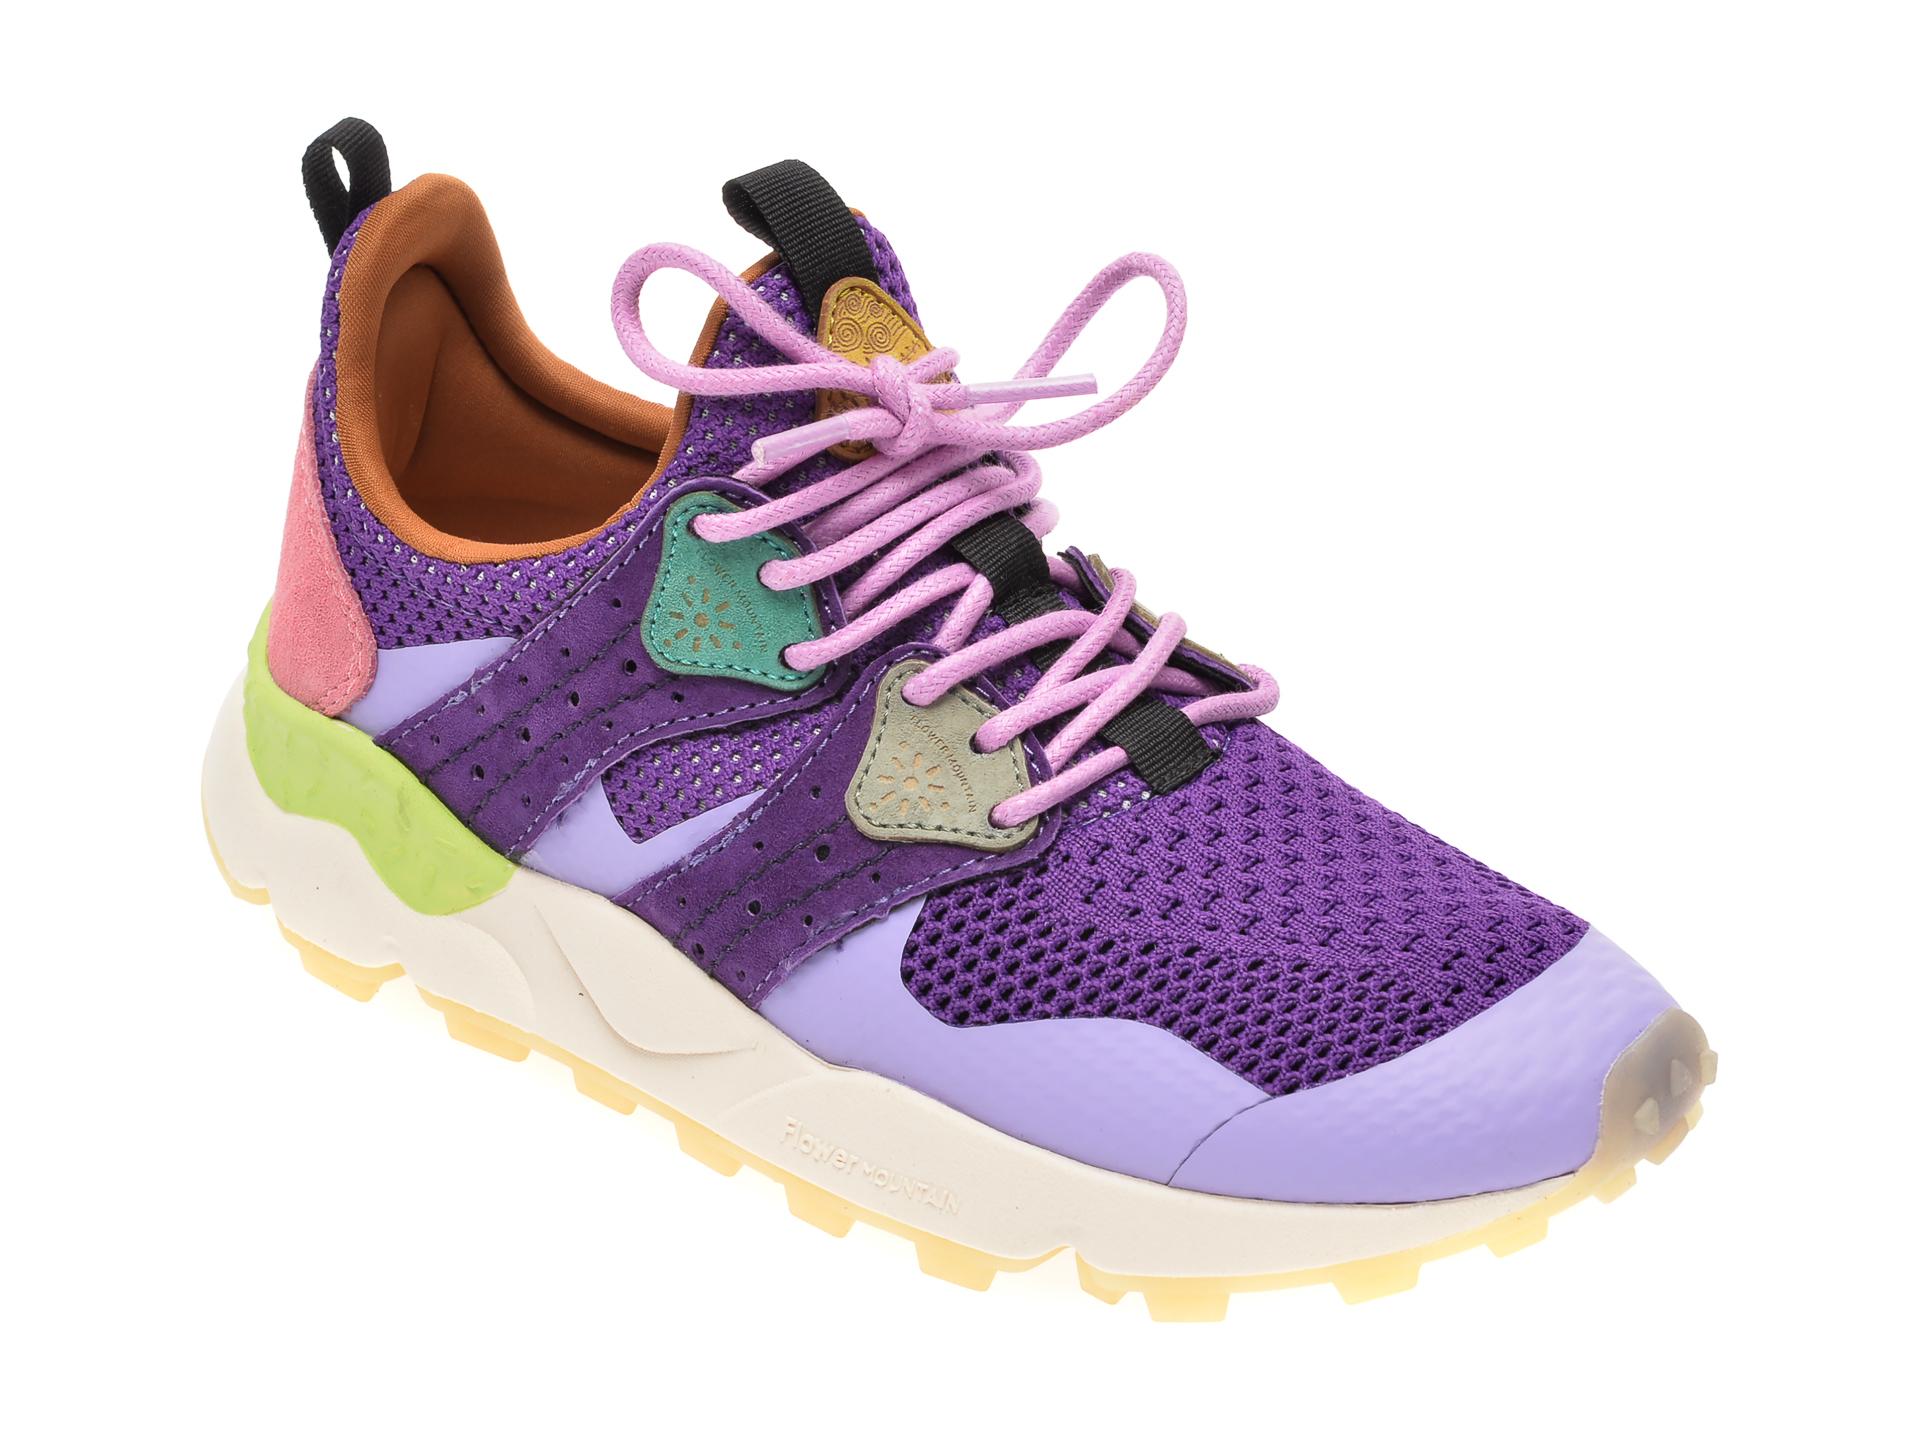 Pantofi sport FLOWER MOUNTAIN mov, 2014761, din material textil si piele naturala